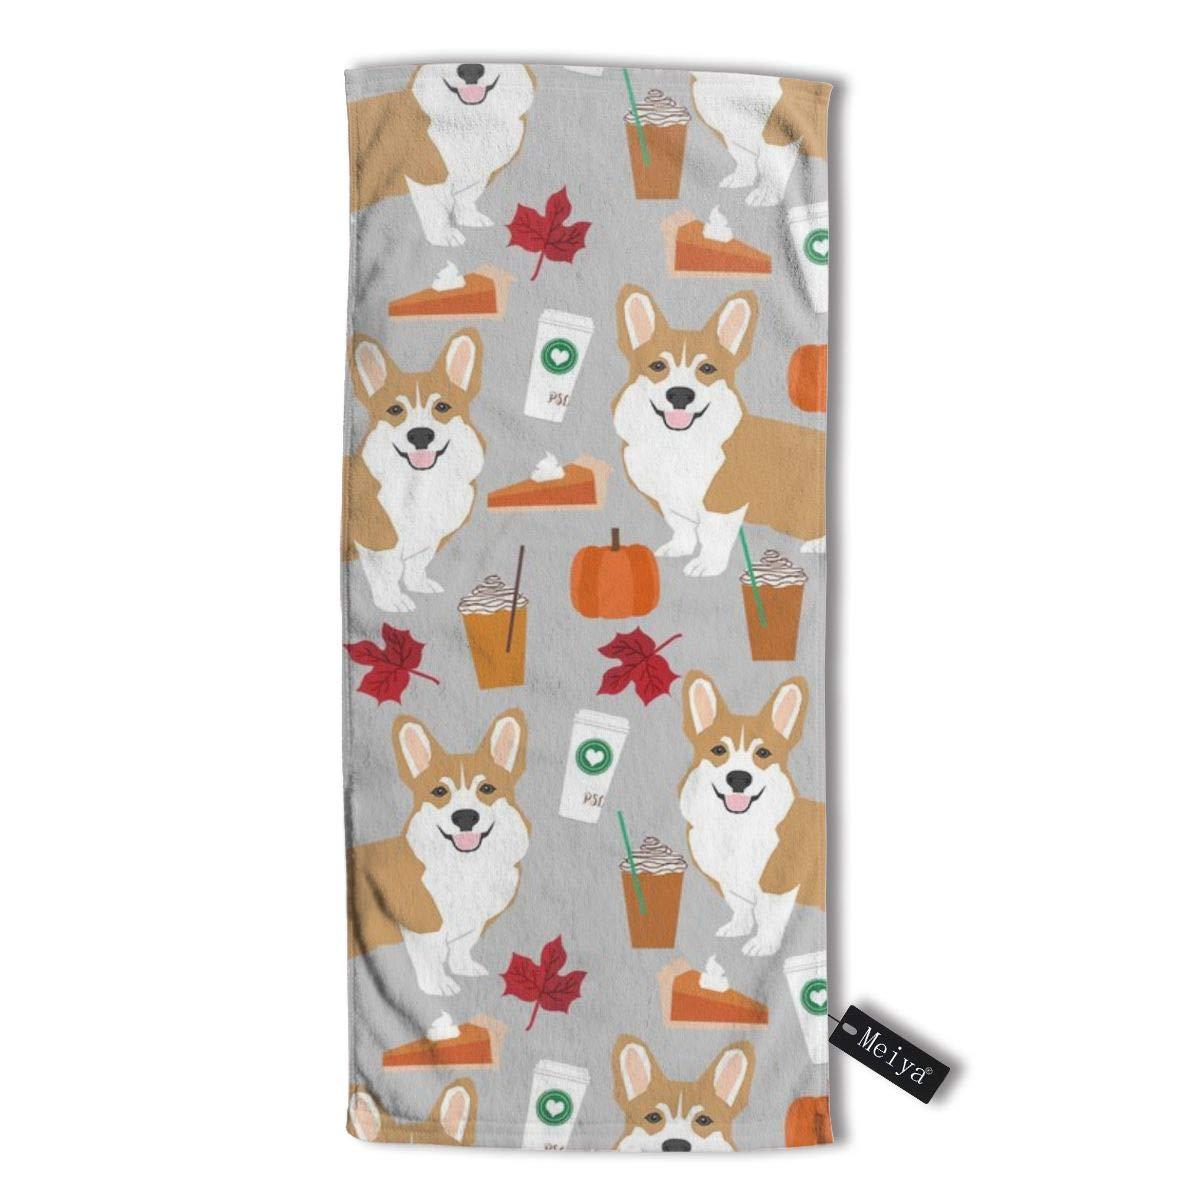 Dog Dogs Coffee Latte Pumpkin Spice Gym and Spa Hand Corgi Corgis Multipurpose Towels for Bath Face Corgi Pumpkin Spice Latte 30 X 70 cm Grey Hand Towel,Travel Towel,Bath Sheet